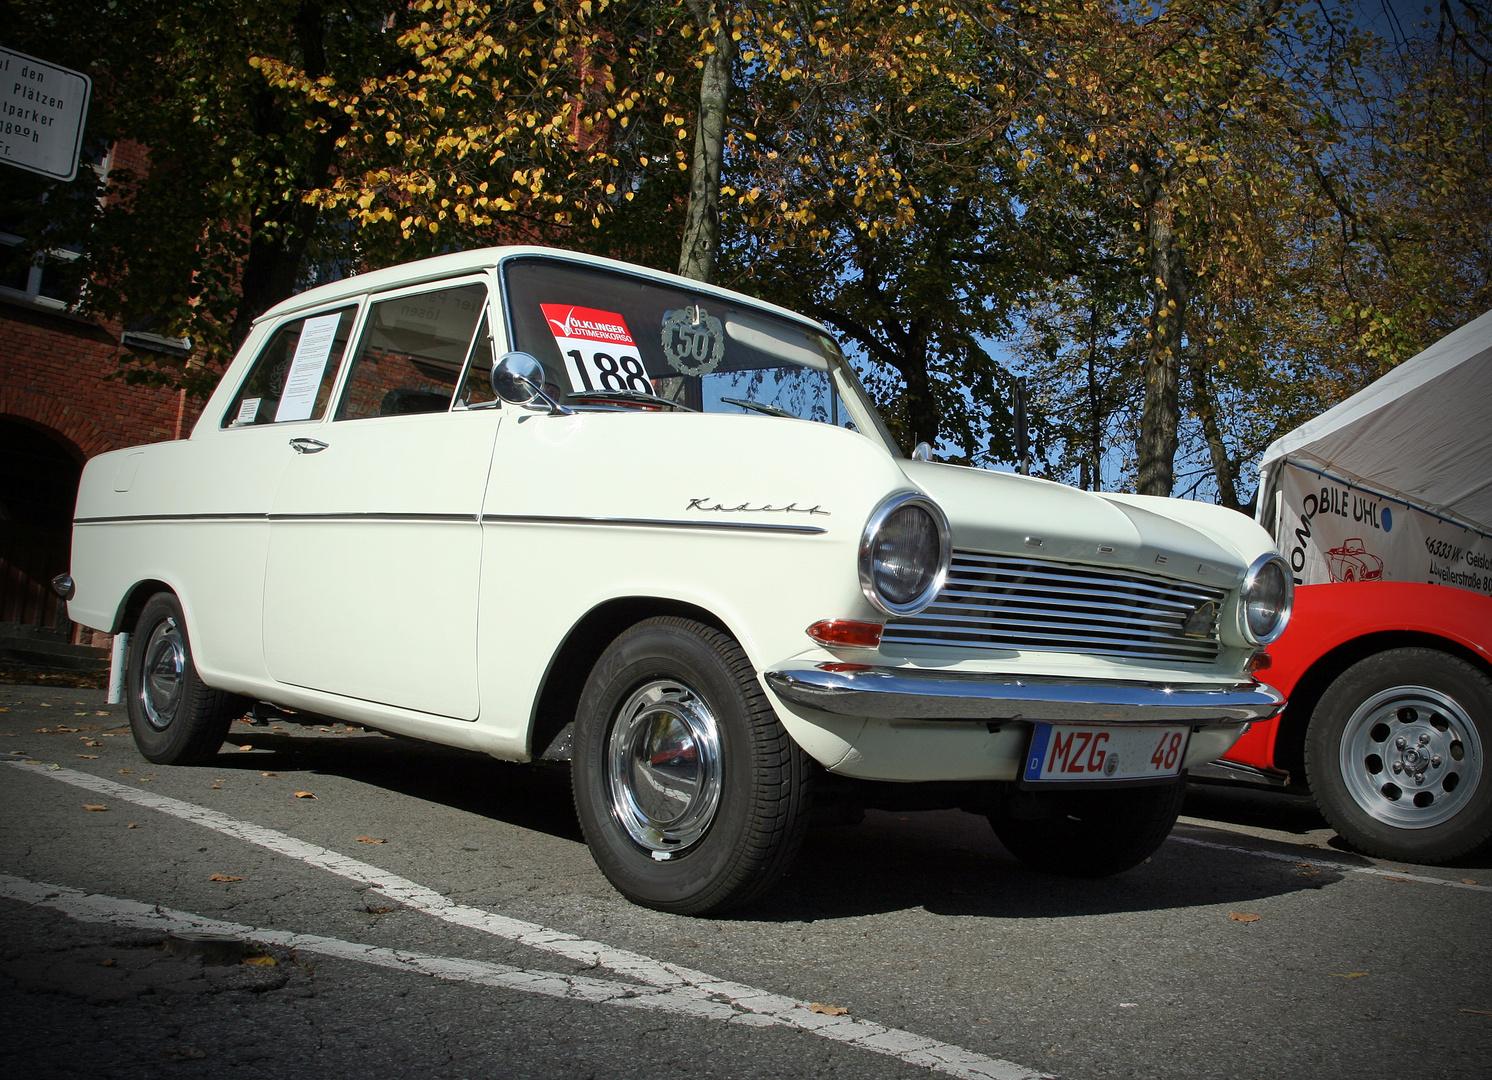 Völklinger Herbsttag 2012 - Opel Kadett